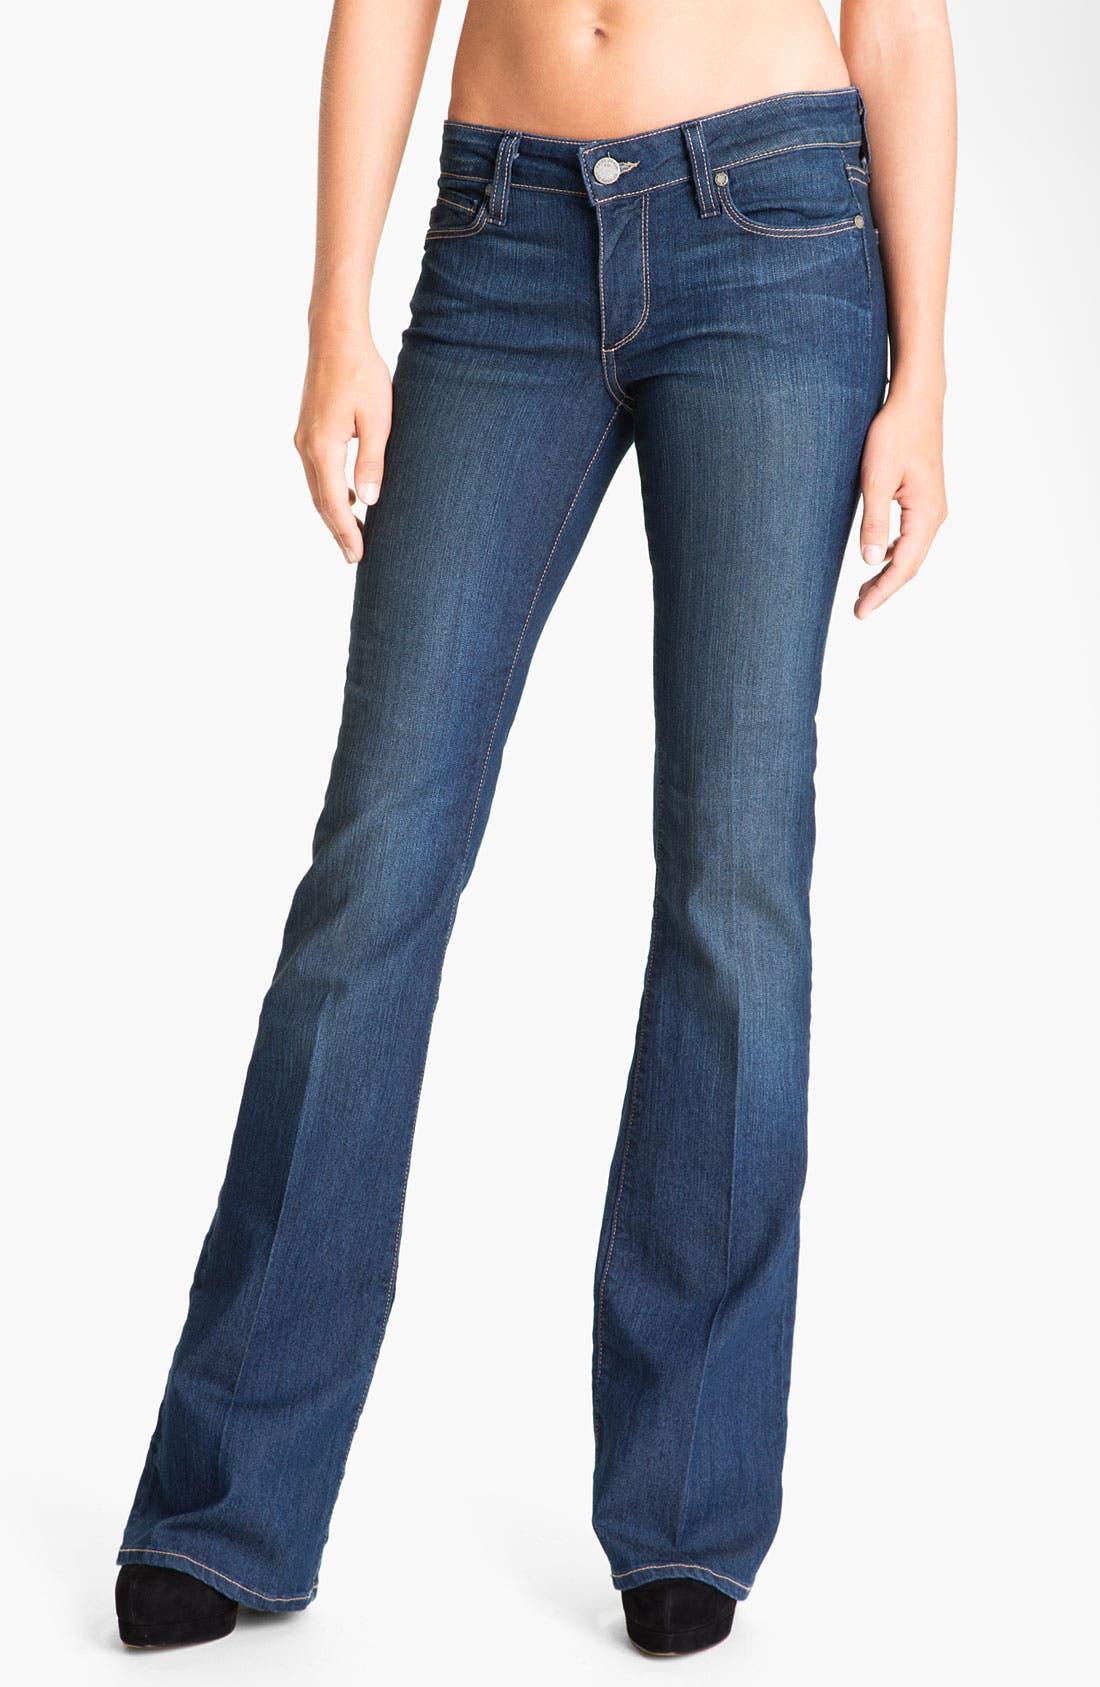 Main Image - Paige Denim 'Skyline' Bootcut Jeans (Finley)